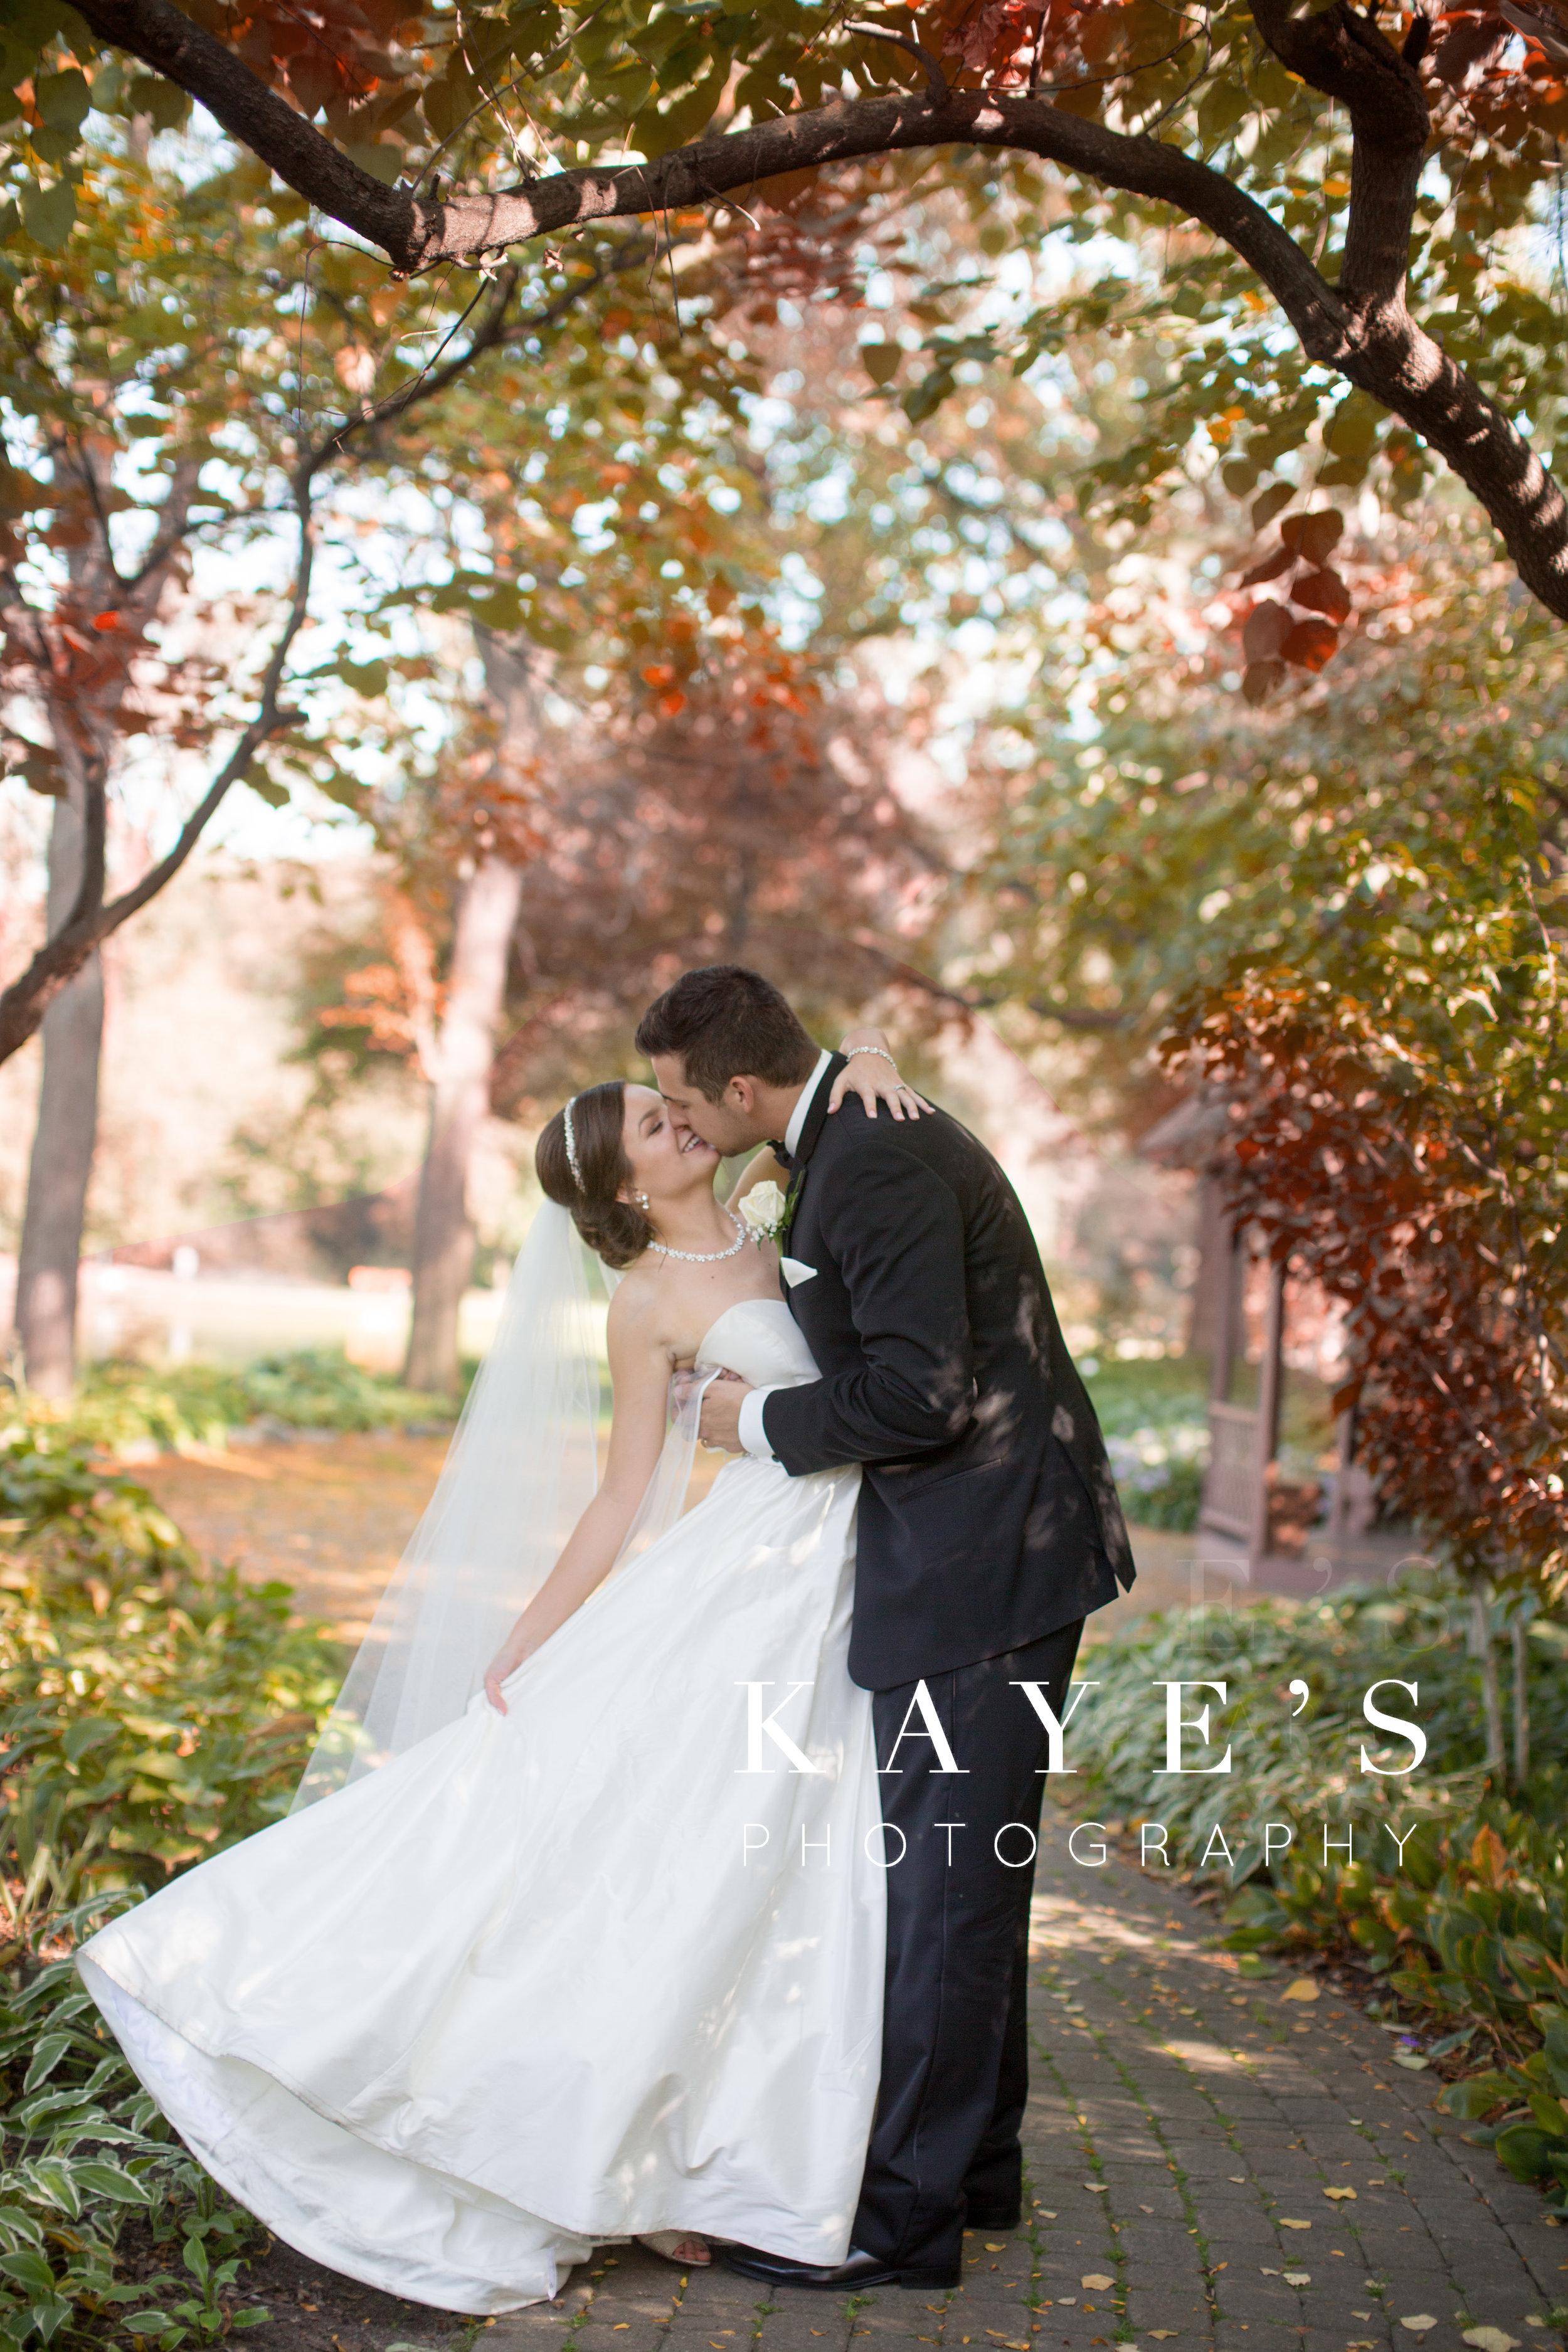 Kayes-photography-michigan-wedding-photographer